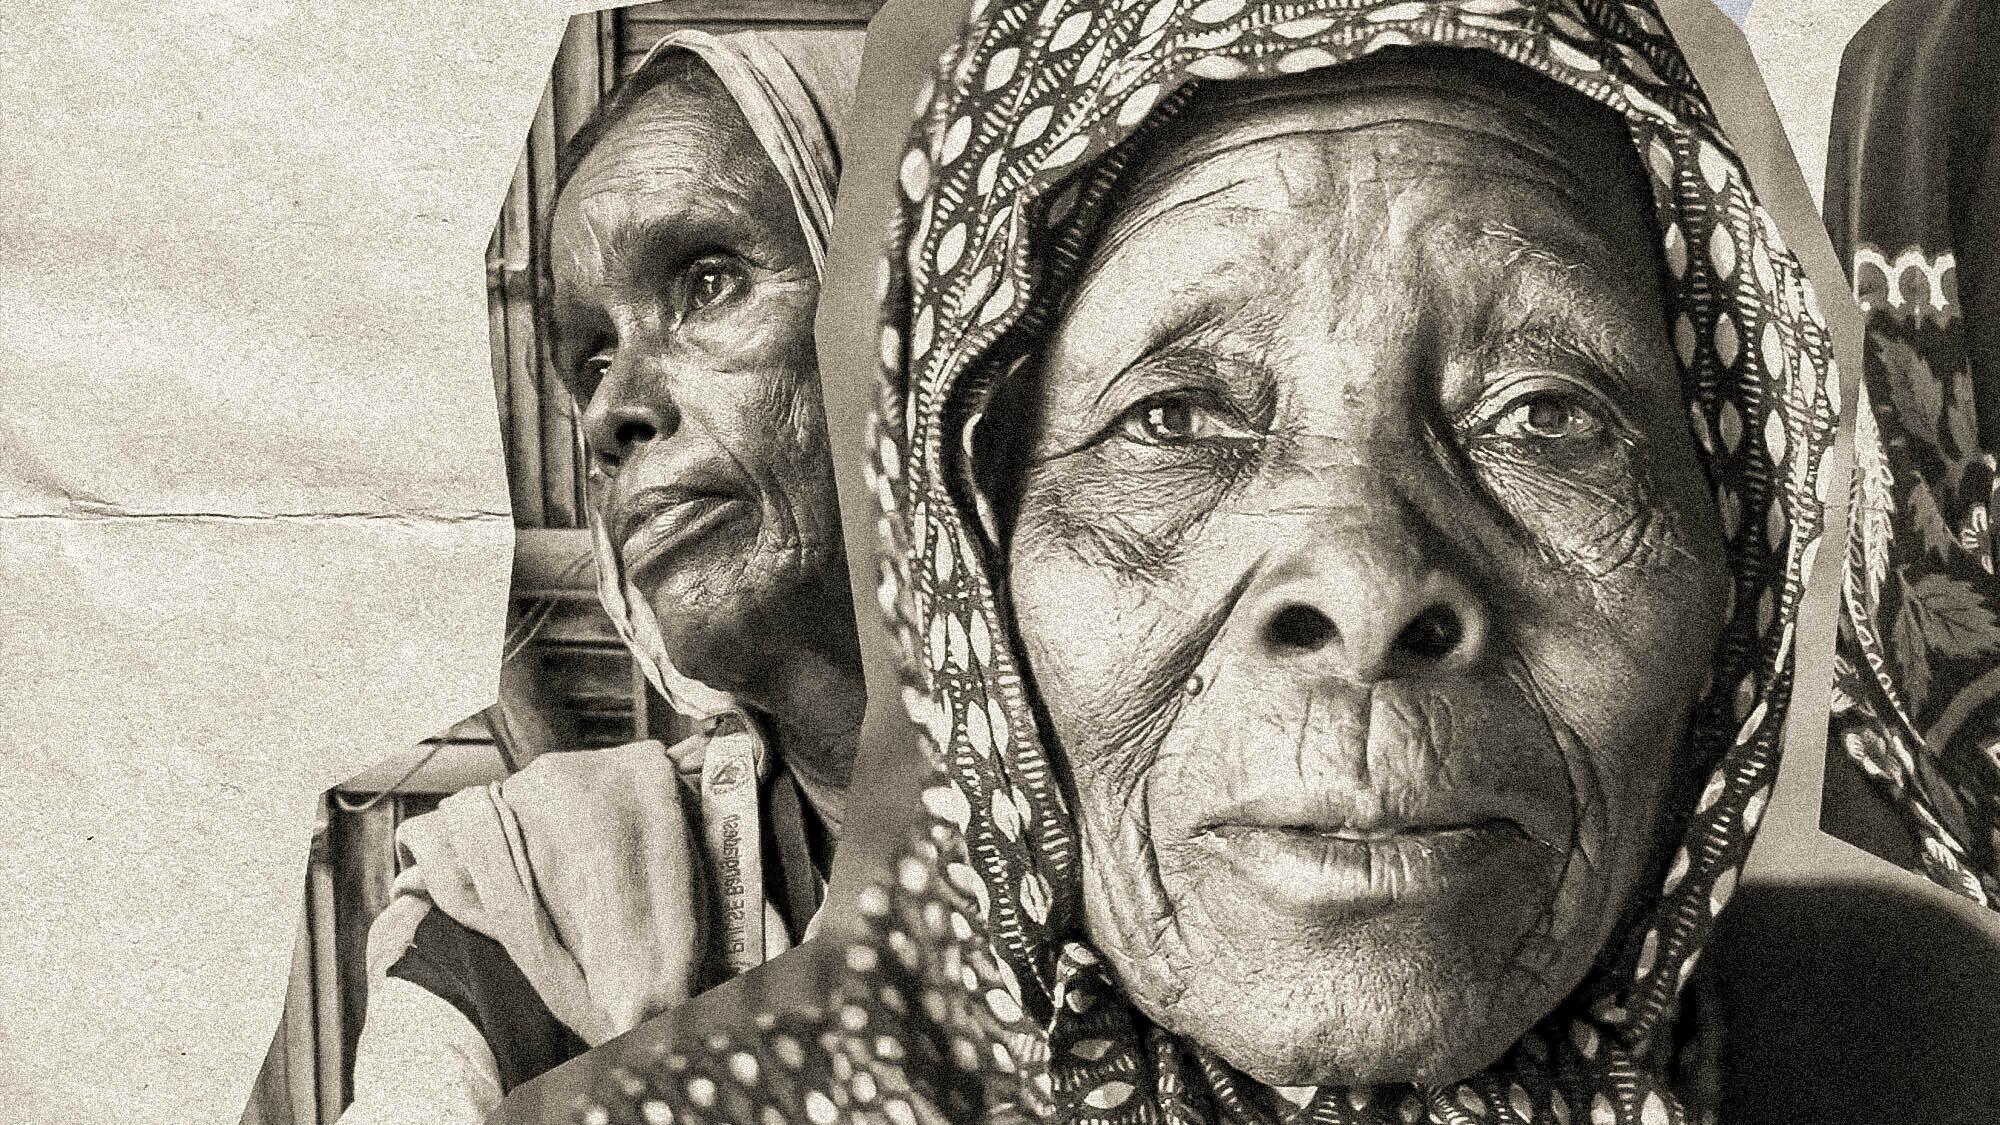 Sketchbook illustration using black and white photographs of 2 refugee women